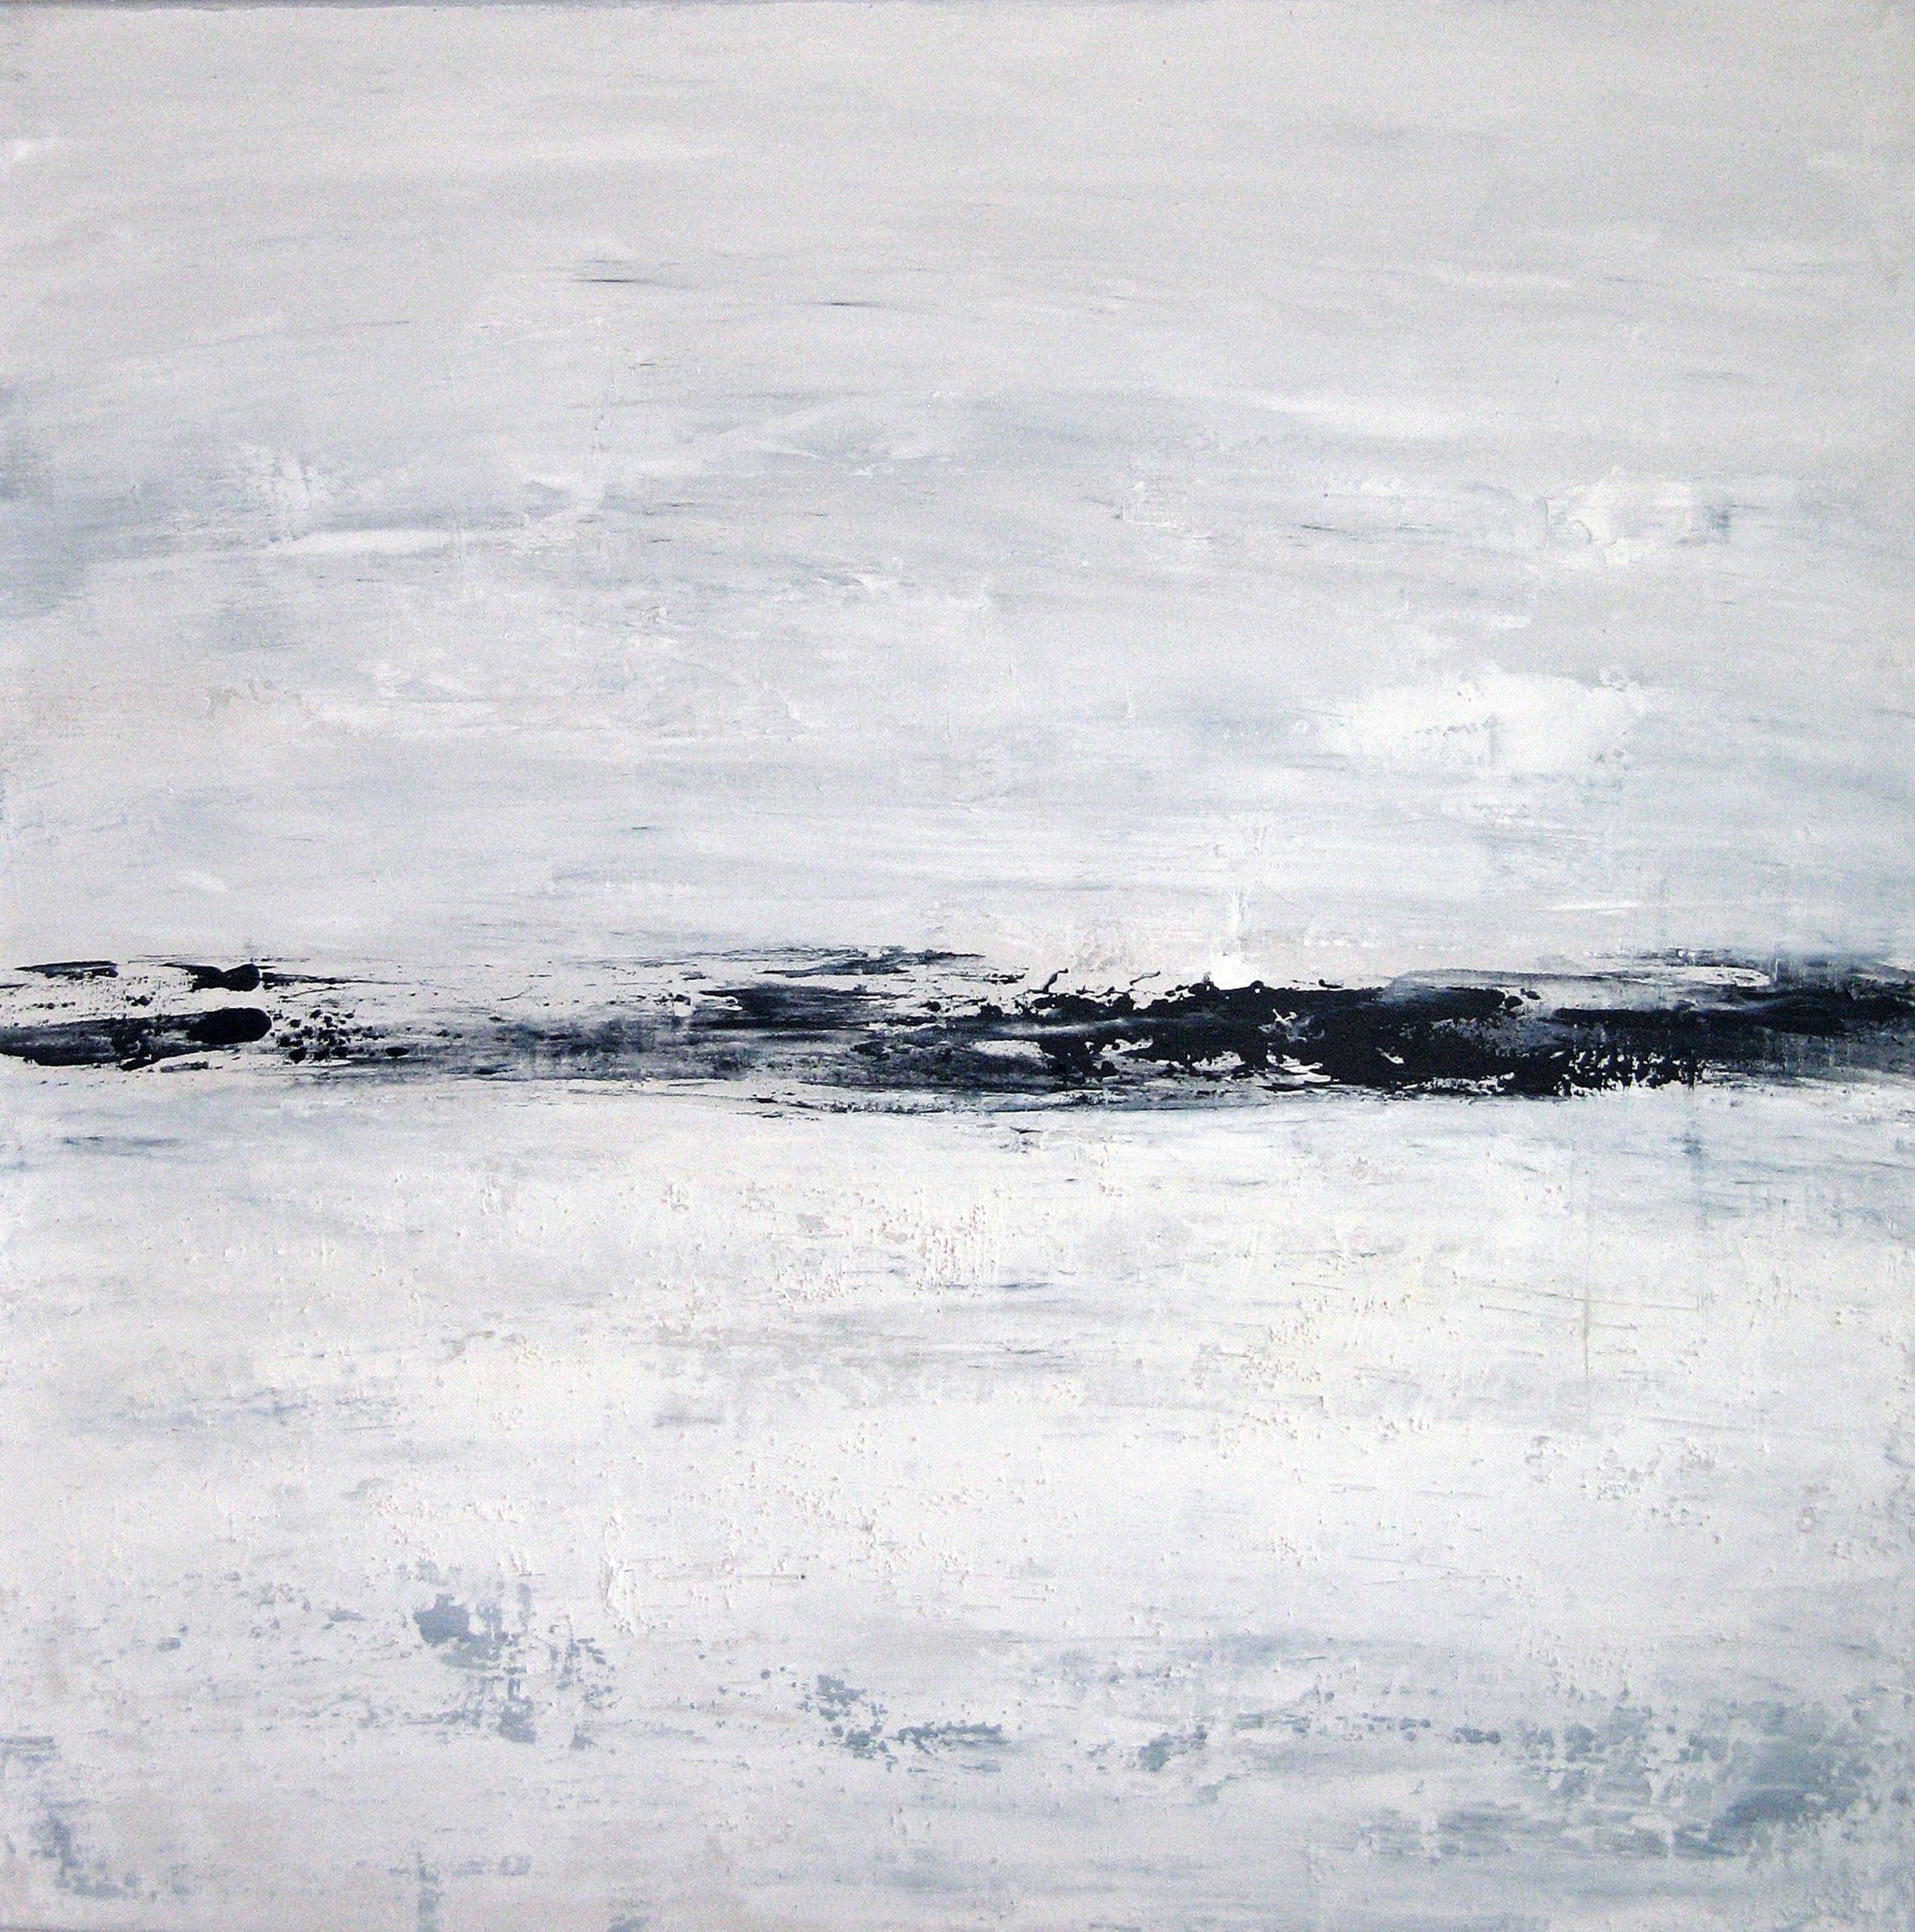 Argato - Kunstwerke der informellen Kunst – Argato.de